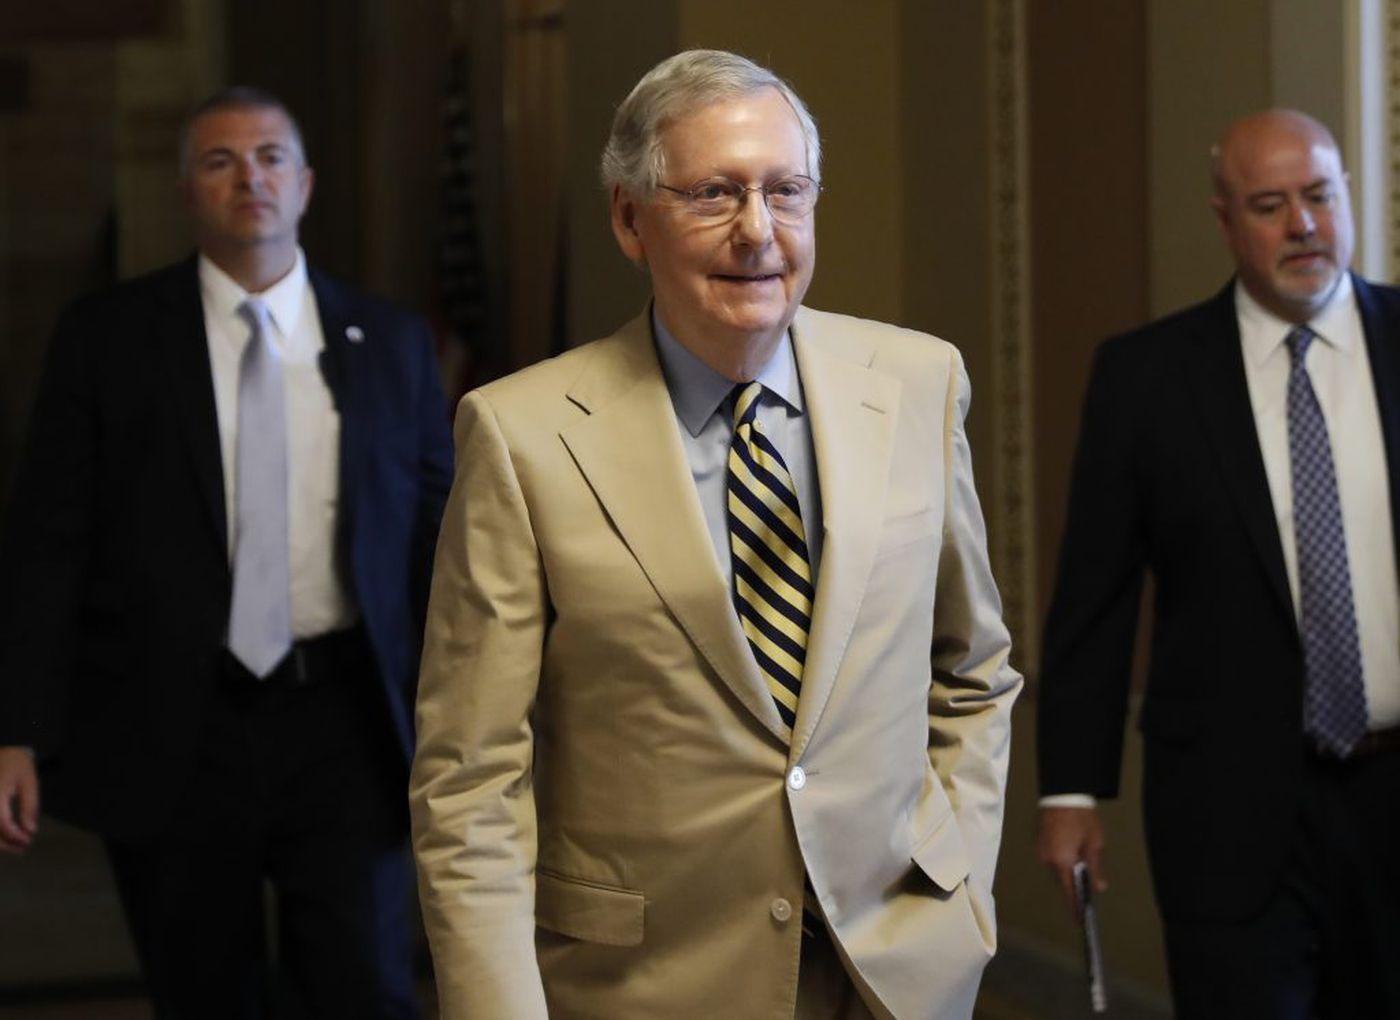 Senate health plan will increase uninsured by 22 million, CBO says